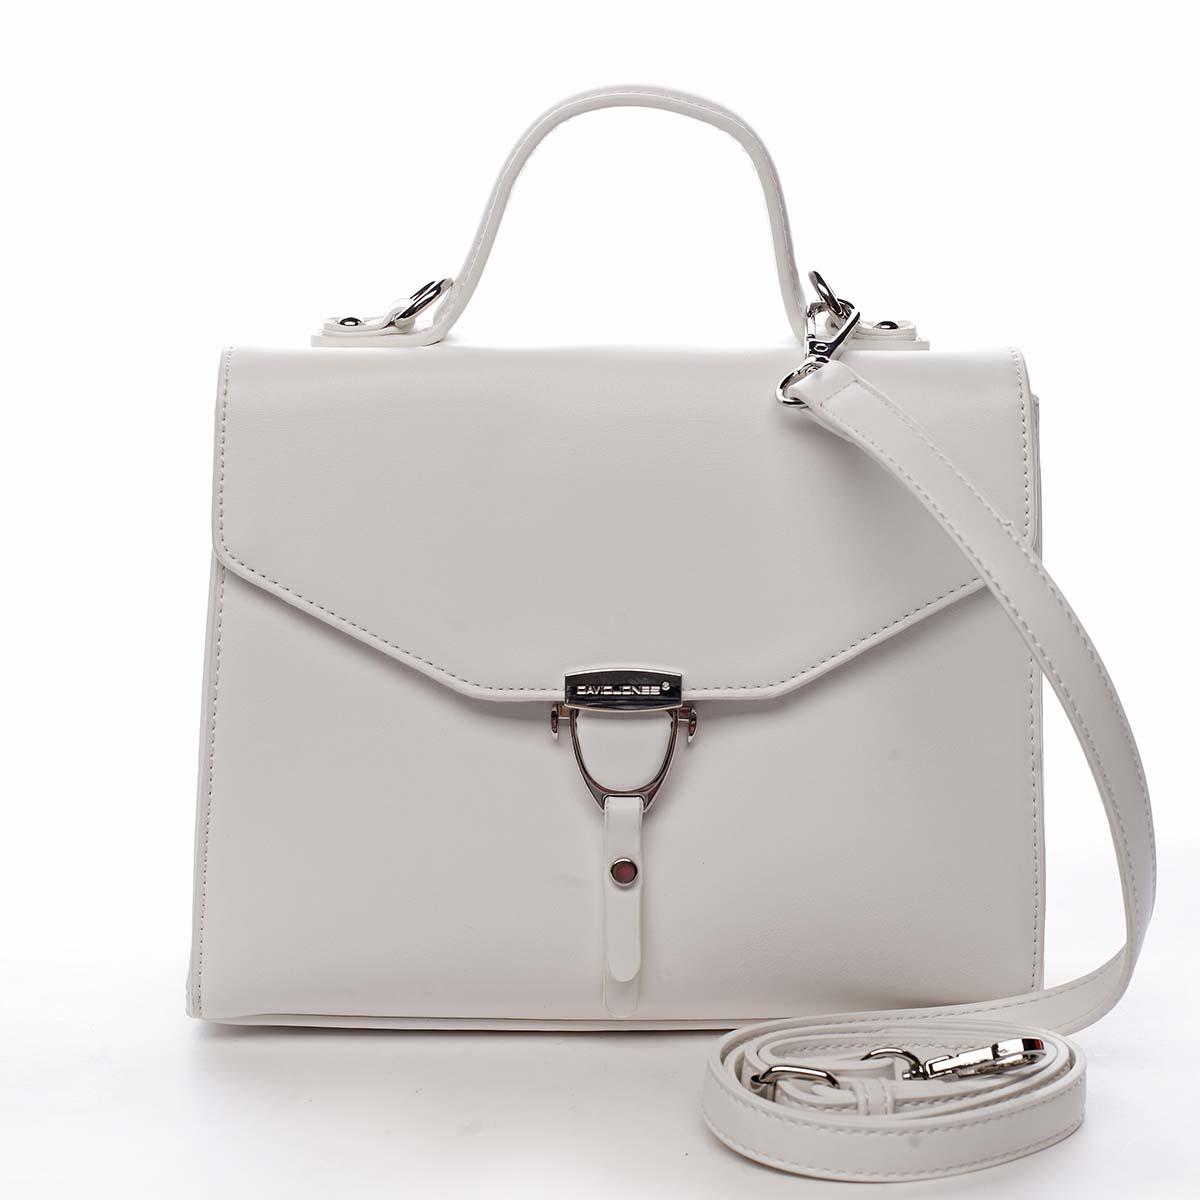 Dámská kabelka do ruky bílá - David Jones California